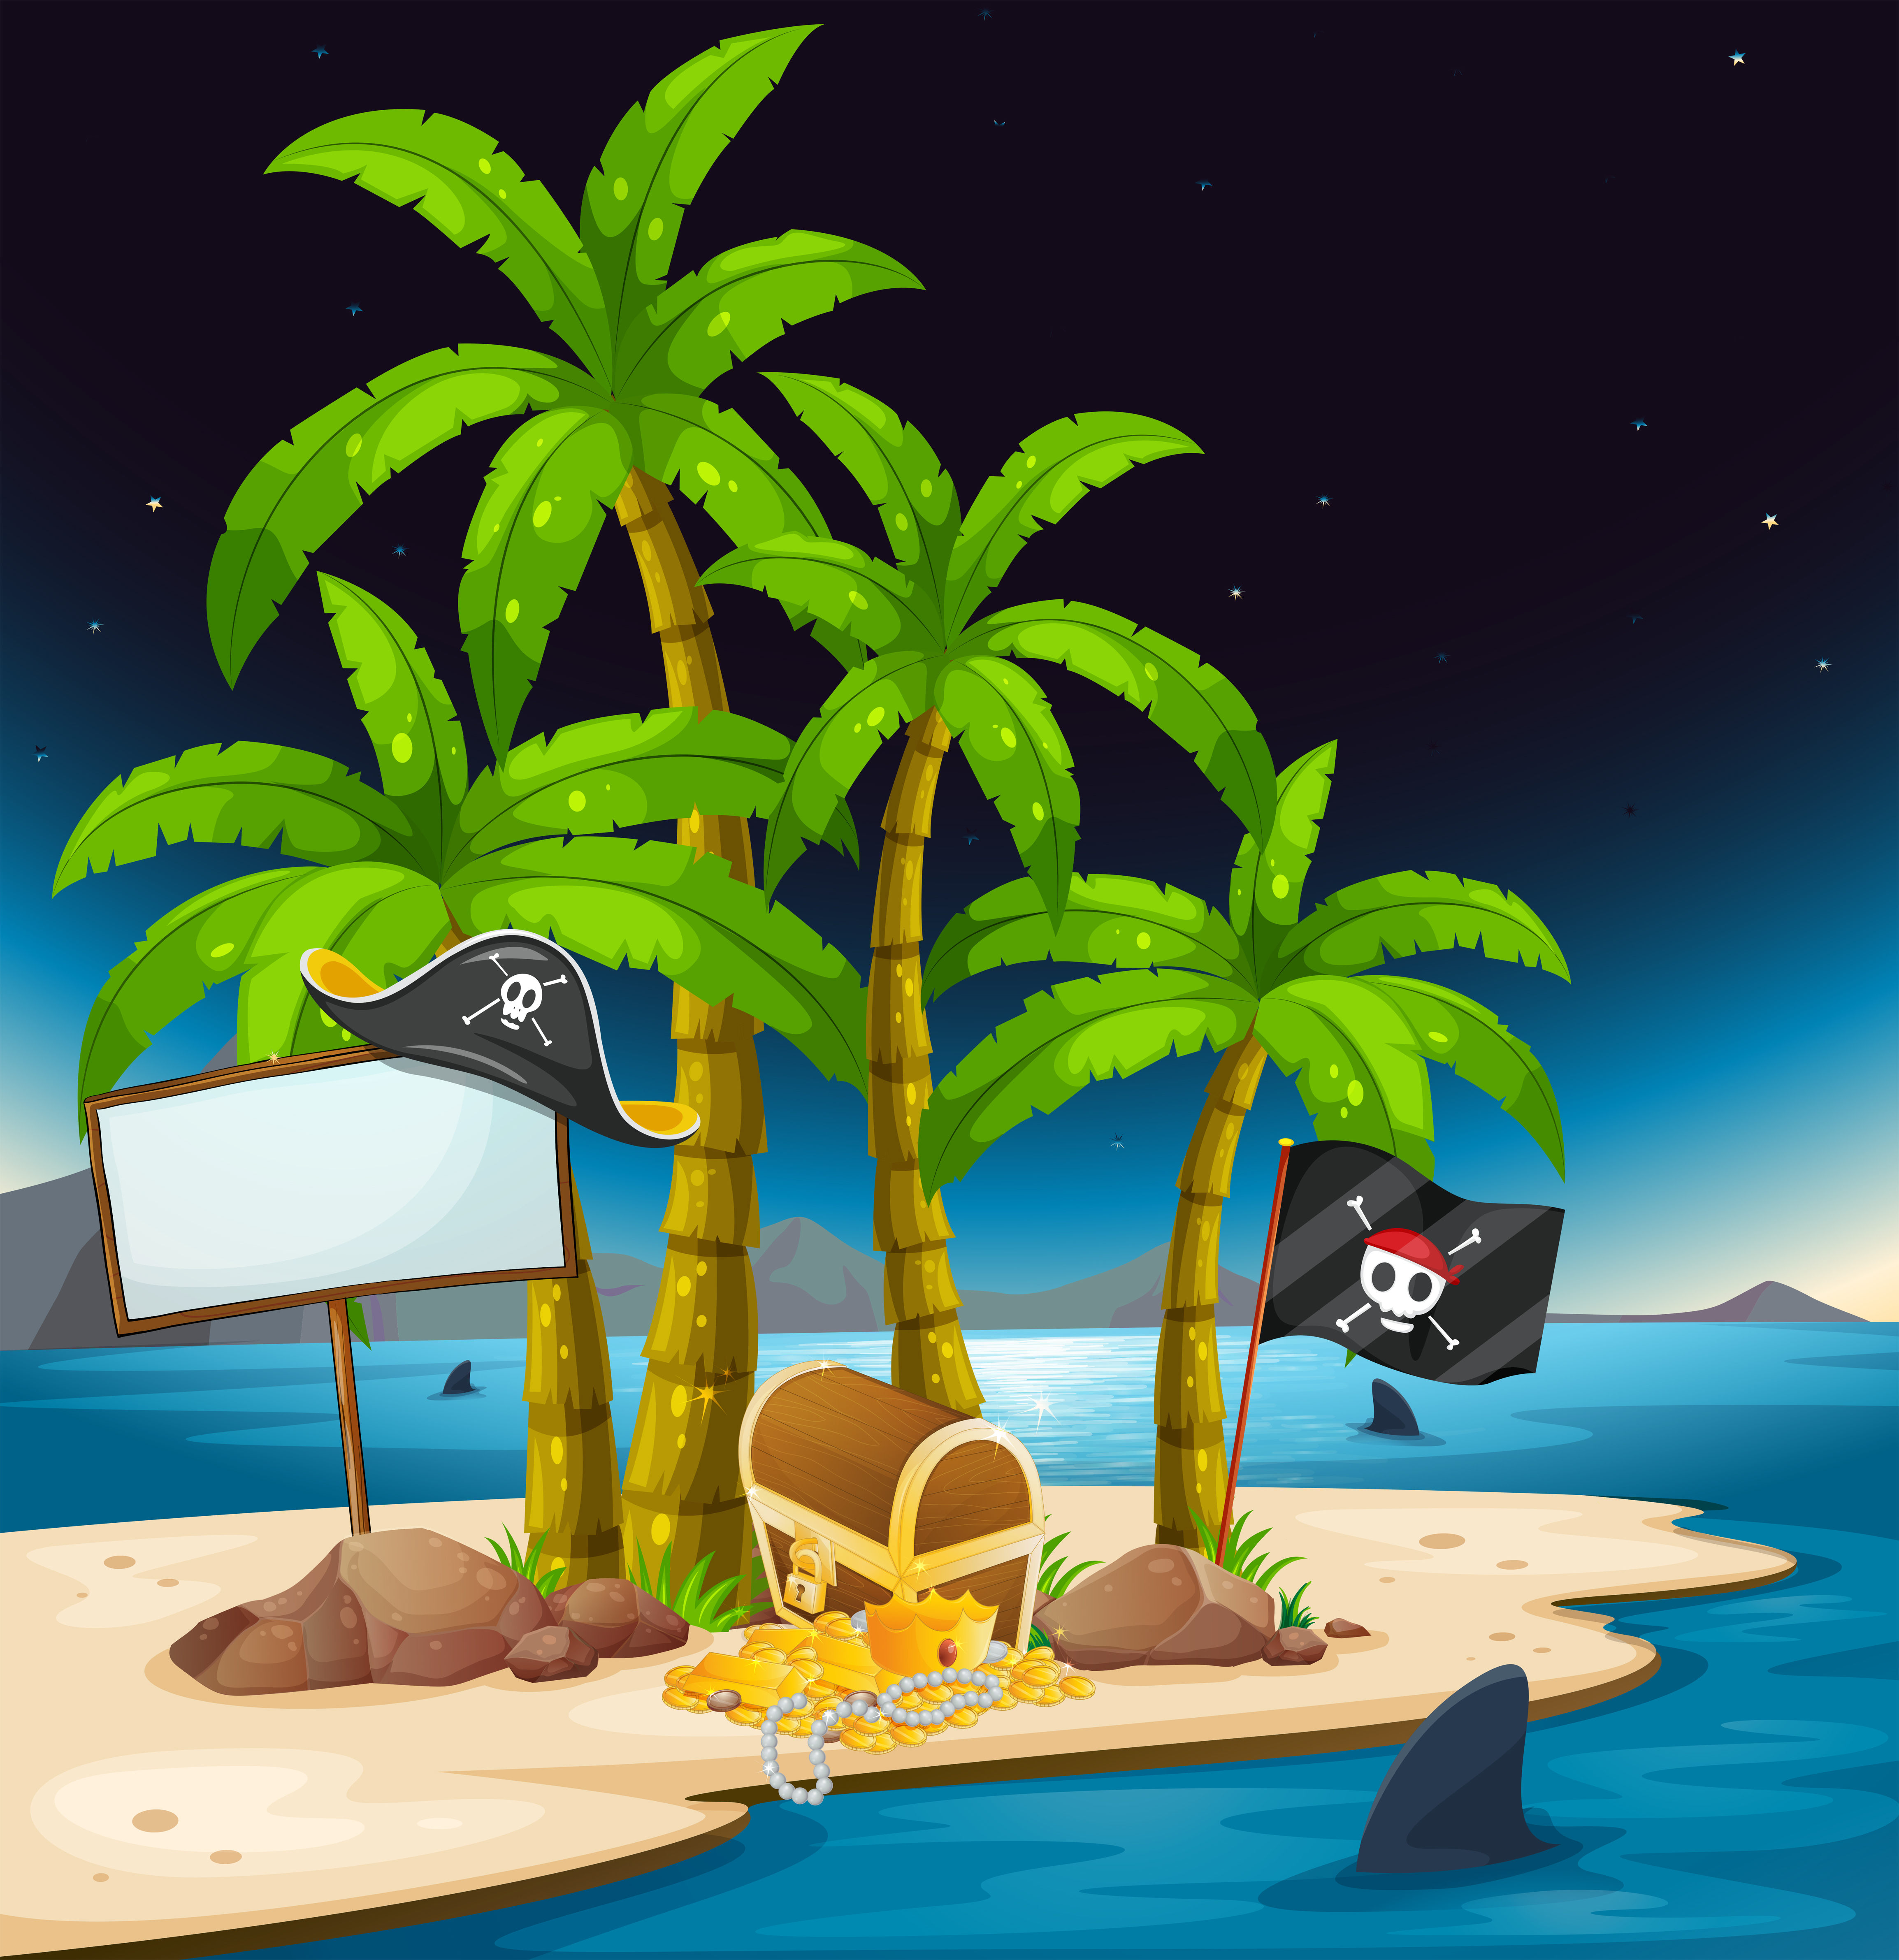 Treasure Island Beach: A Pirate Island With An Empty Signboard